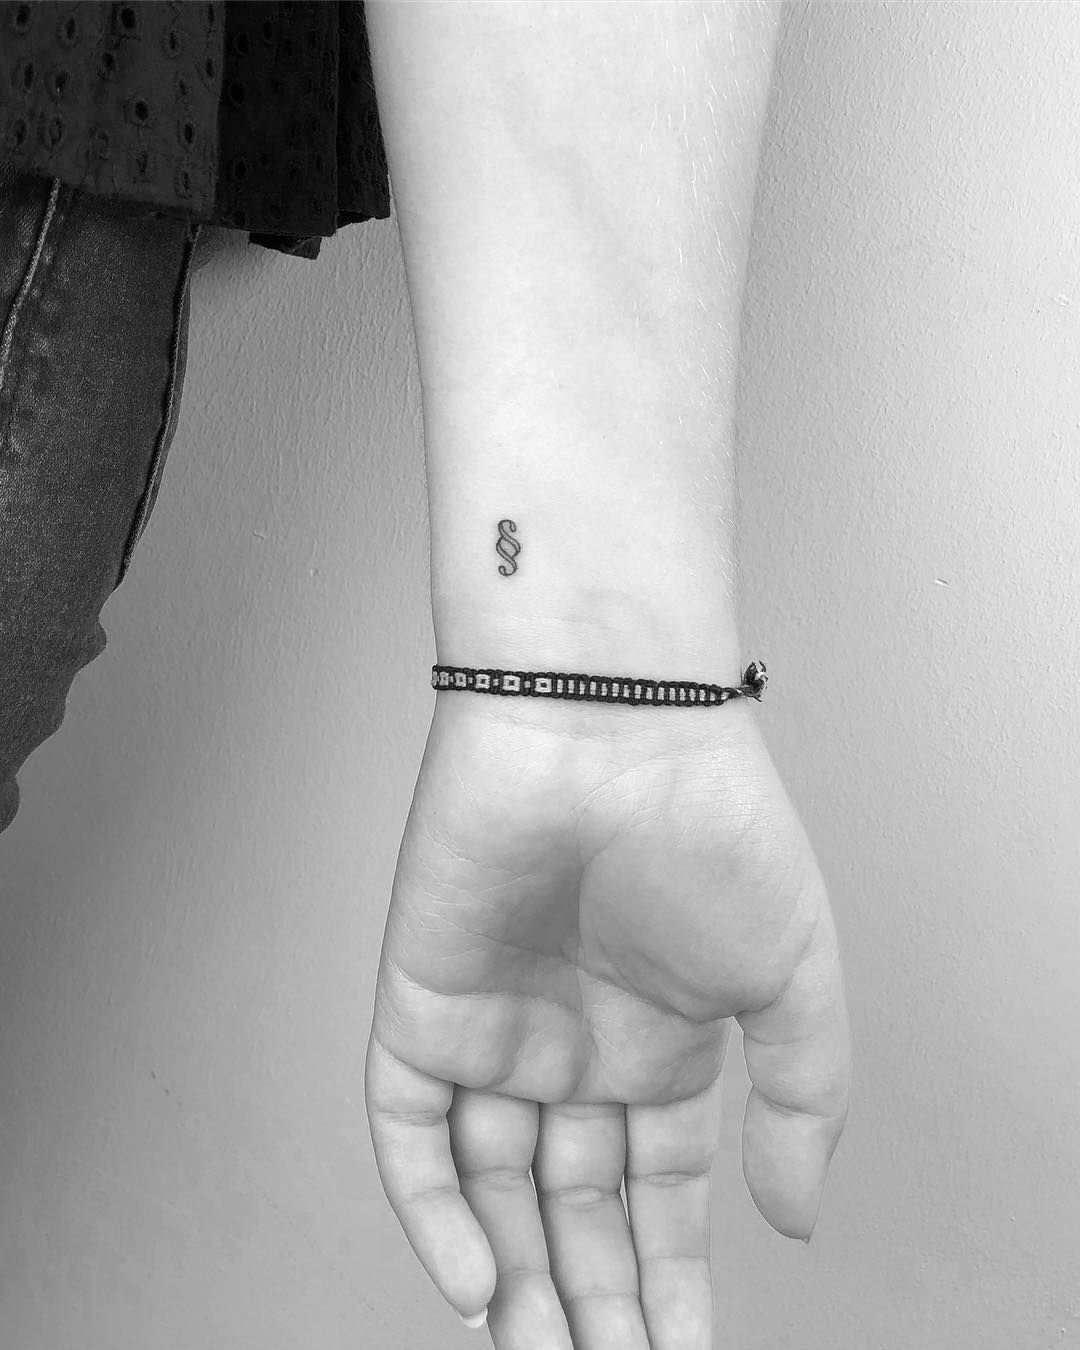 Tattoos for men love love sexy tattoo design idea all men and women will adore  credit